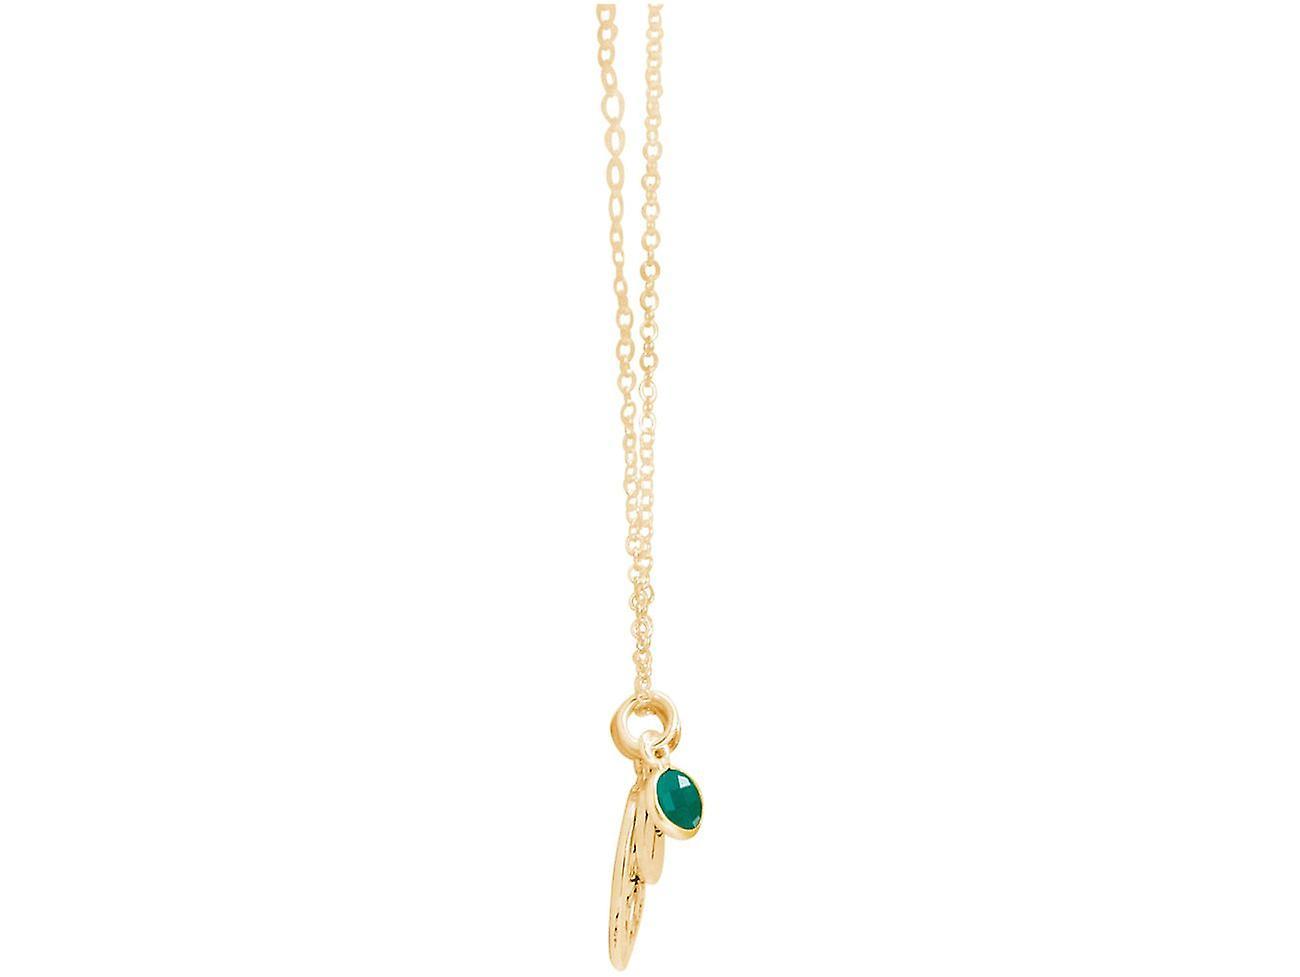 Gemshine Alpin Löwenzahn Pusteblume 925 Silber, vergoldet oder rose - Smaragd